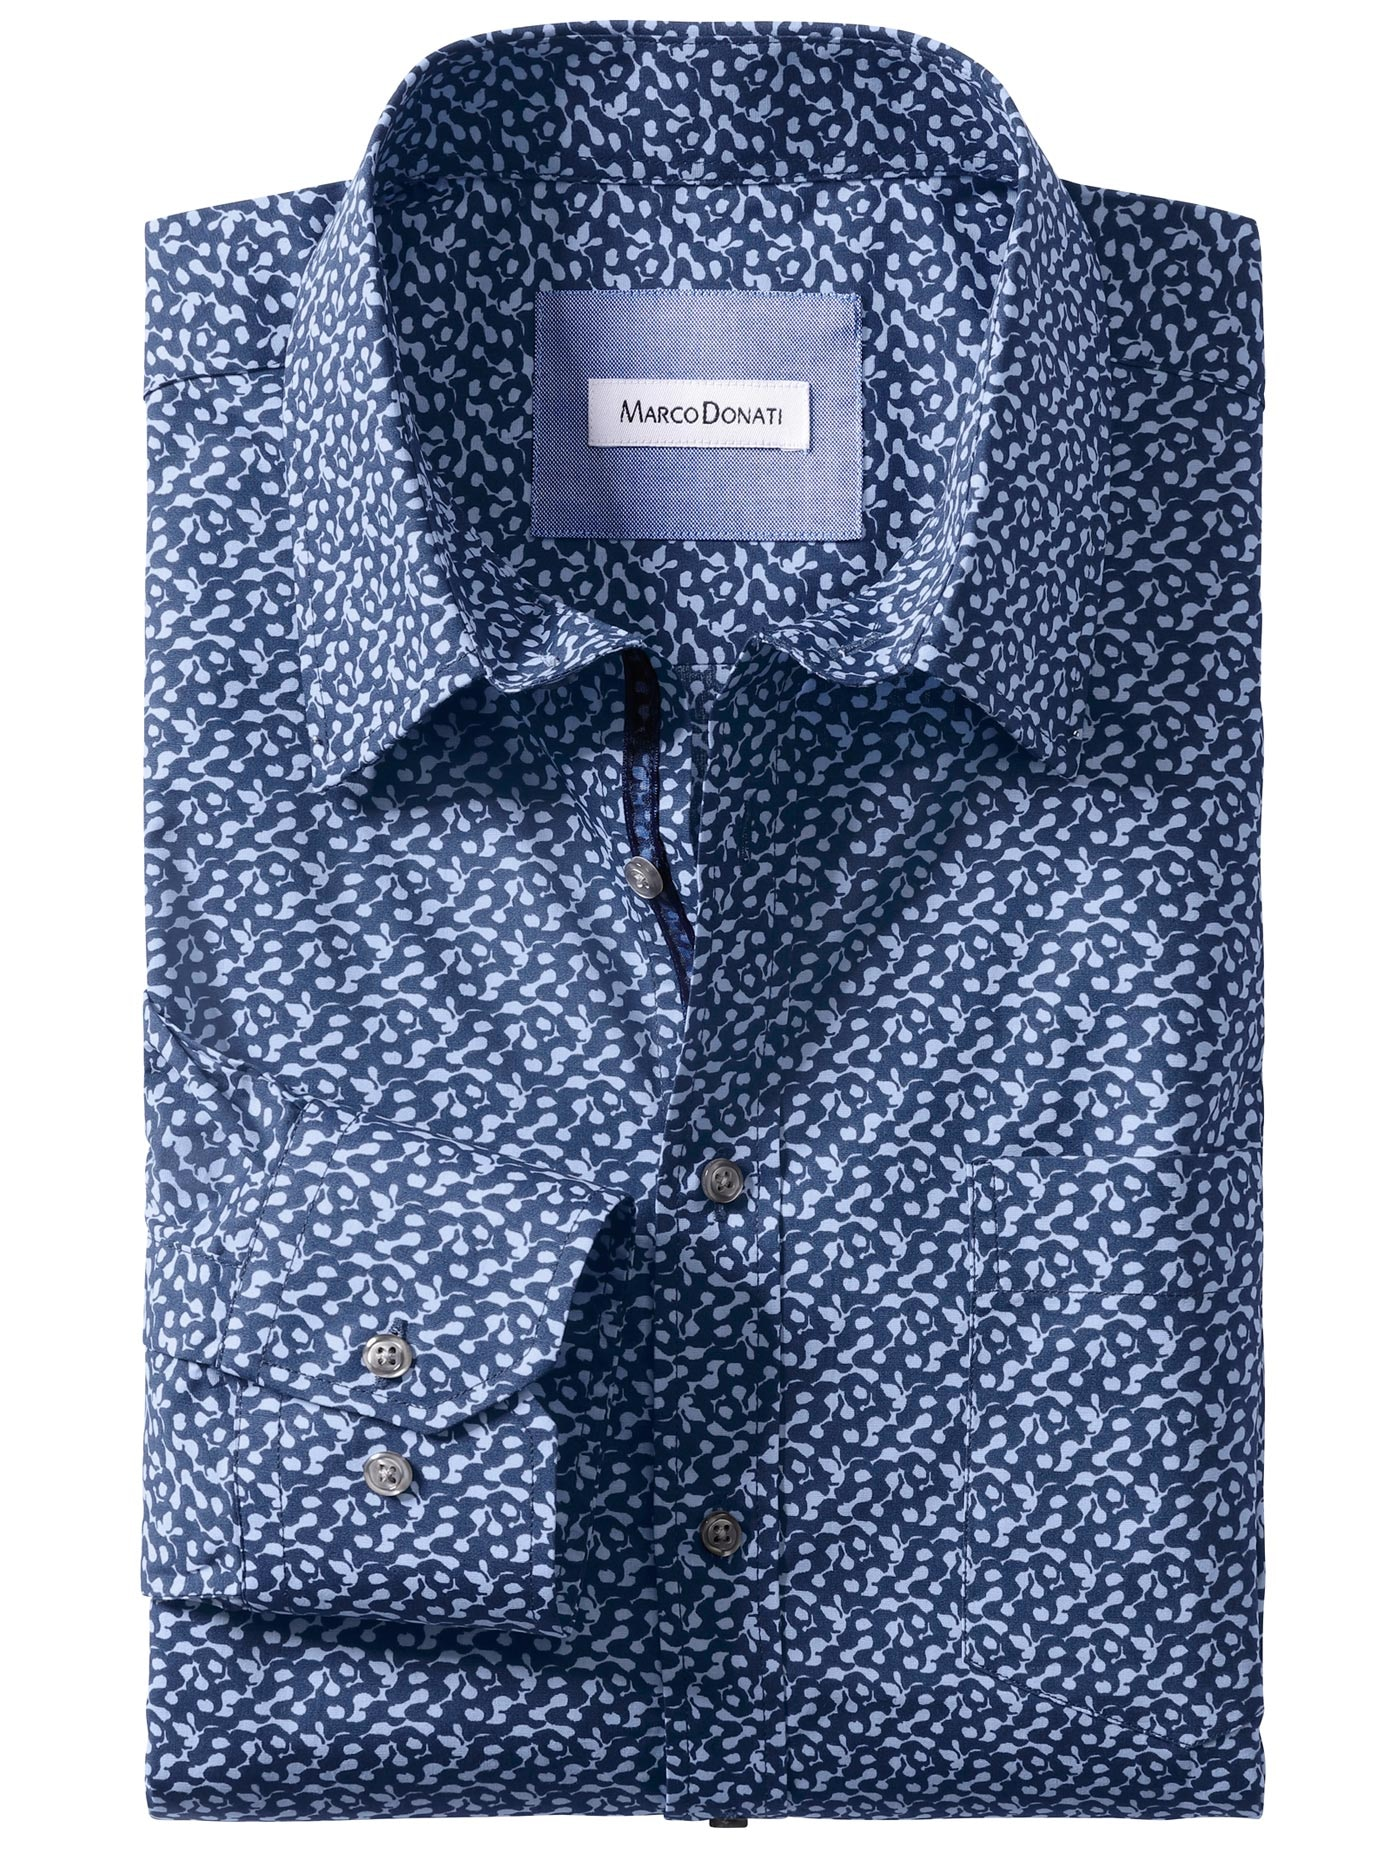 Kontrastkragen Hemd Grau | Hemden | Ted Baker DE